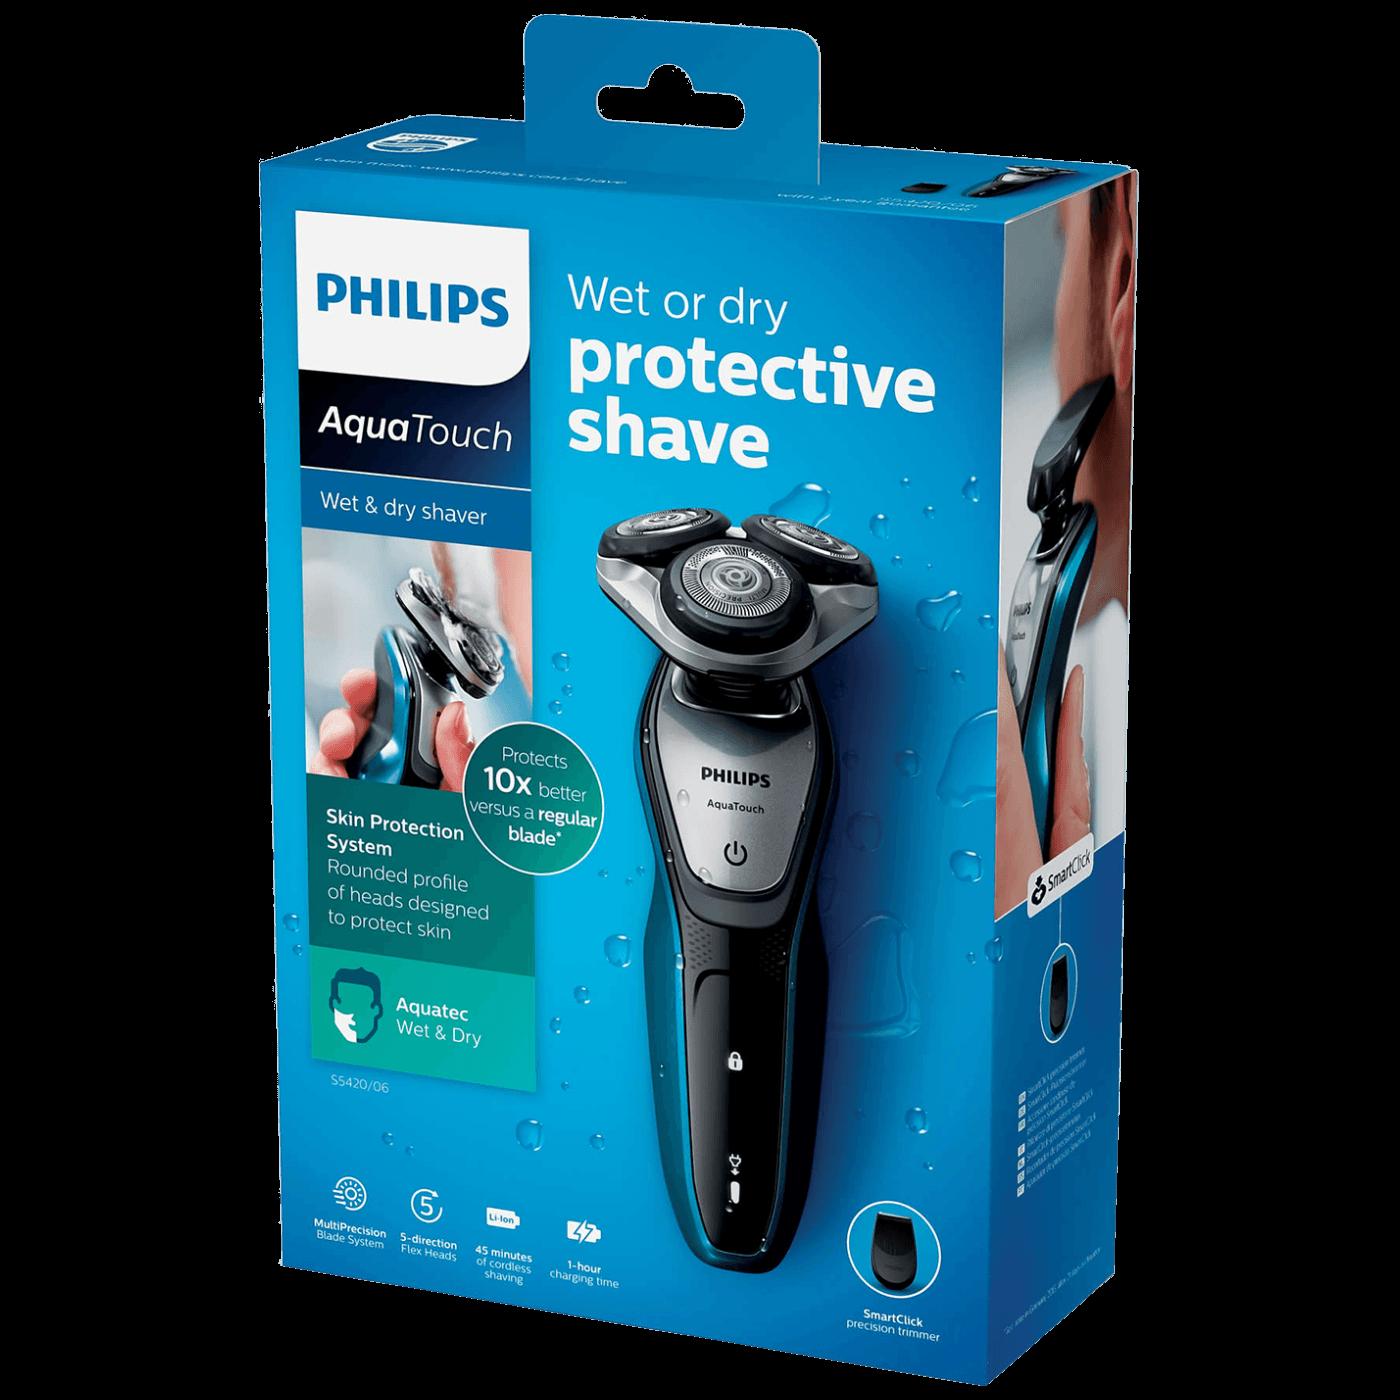 Aparat za suho i mokro brijanje,  Aqua Touch